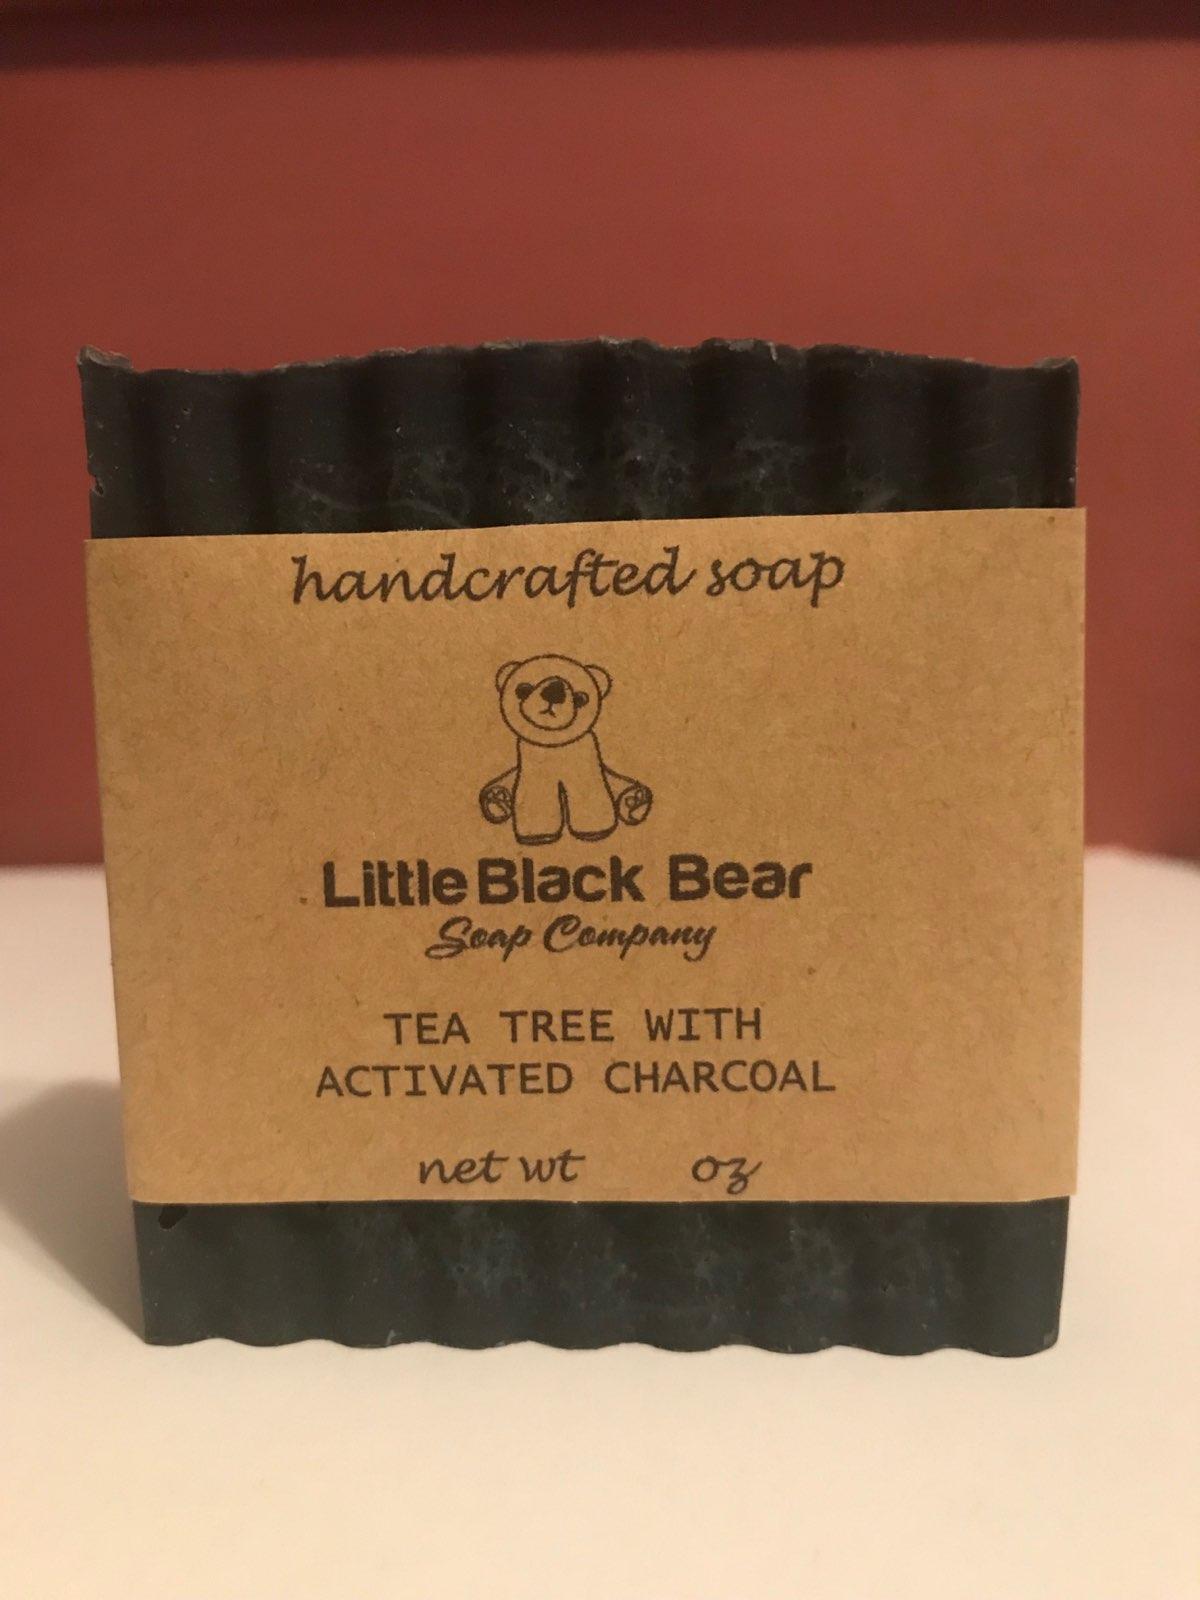 Home | Little Black Bear Soap Company